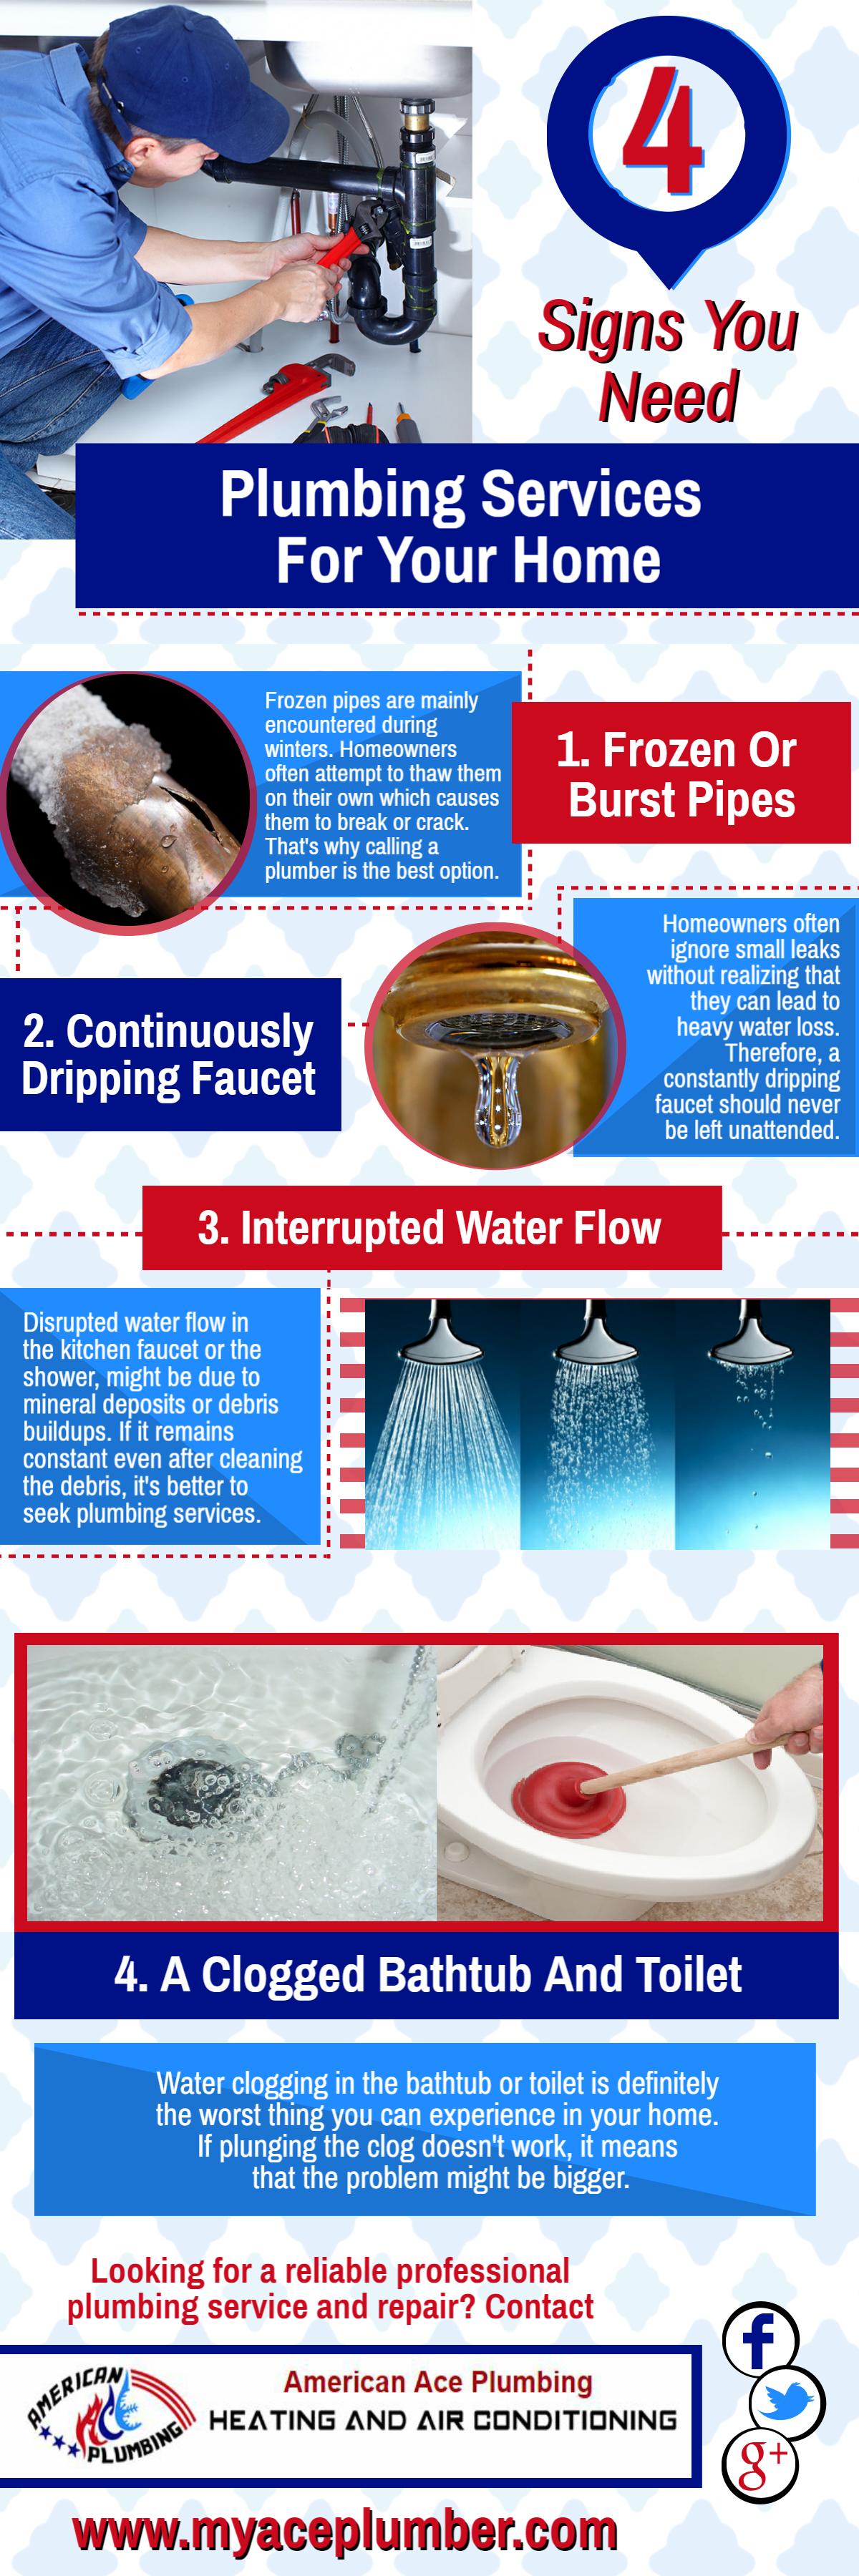 Emergency Plumbing San Diego HVAC & Plumber Services